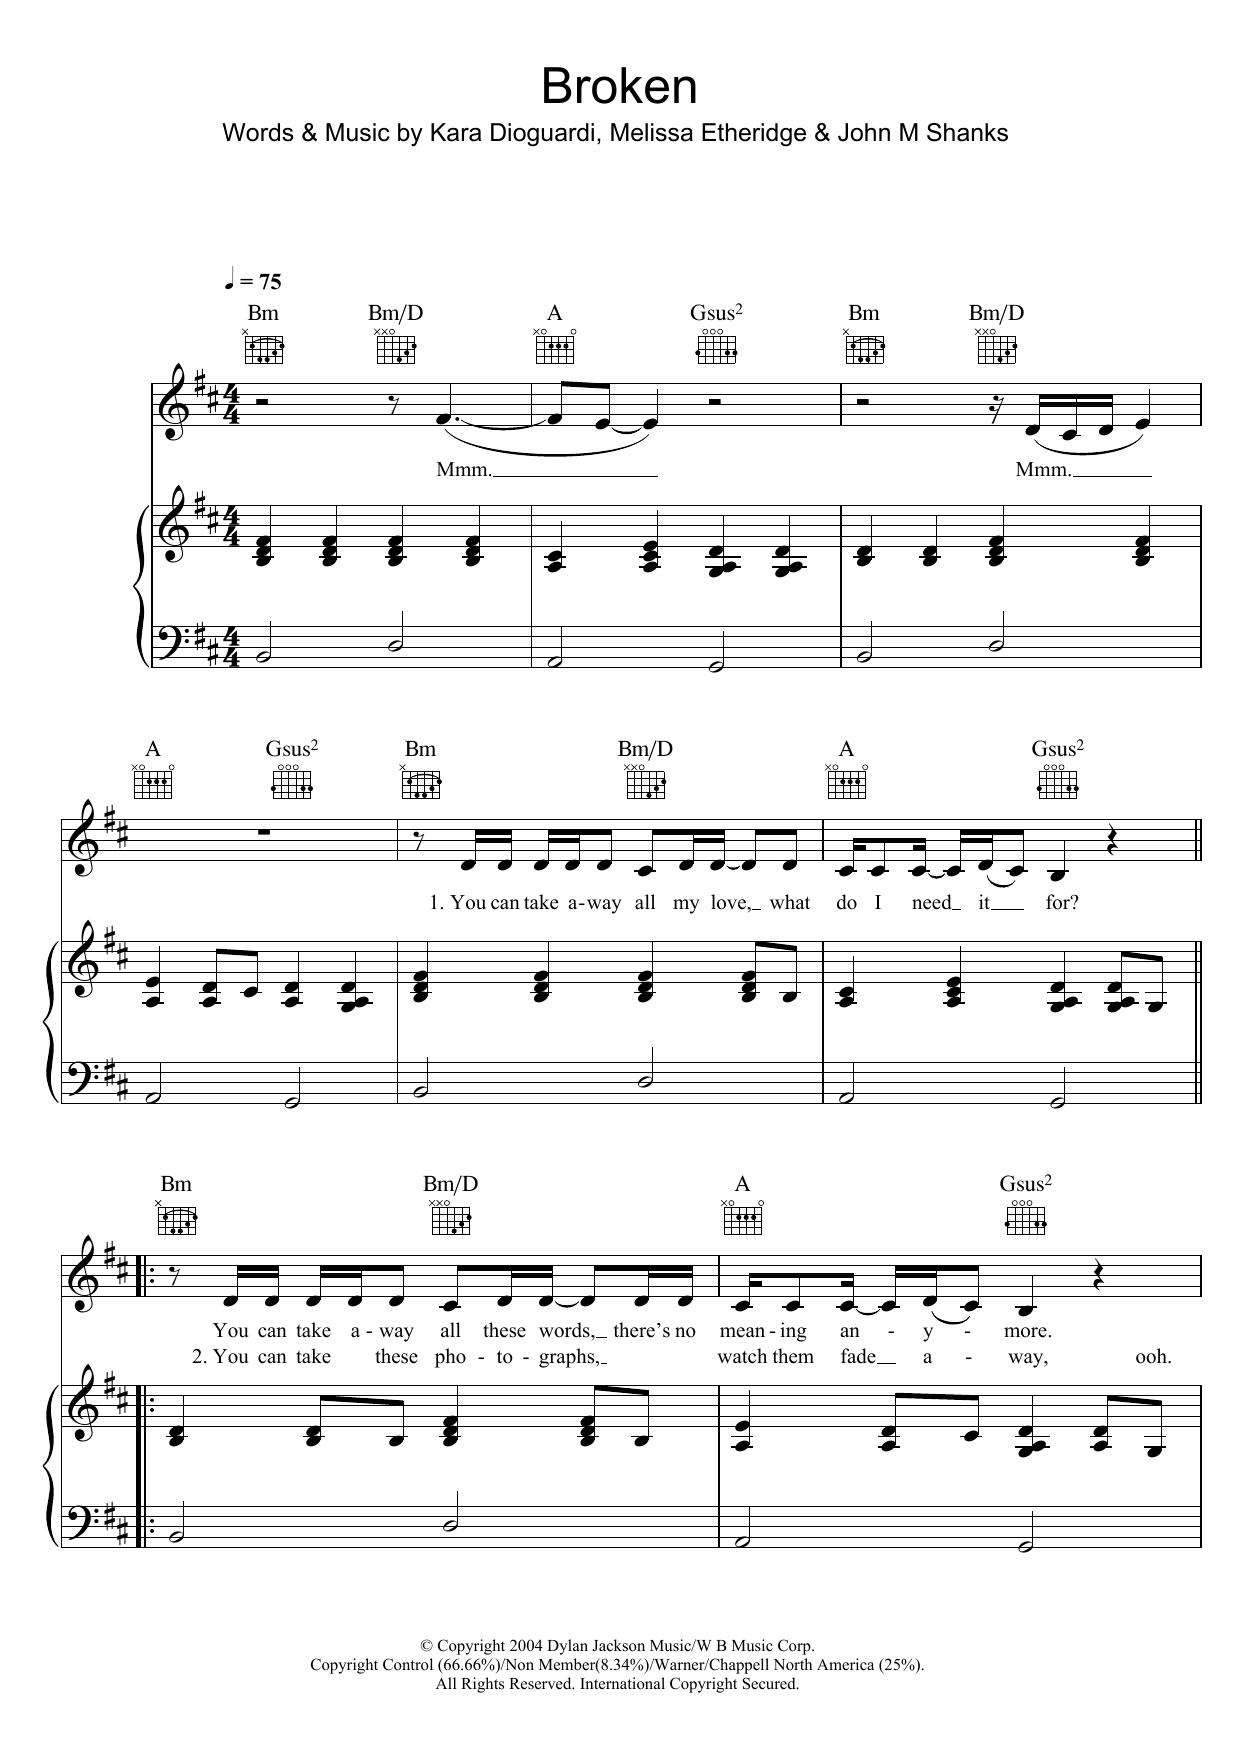 Broken by Leona Lewis Piano, Vocal & Guitar Digital Sheet Music